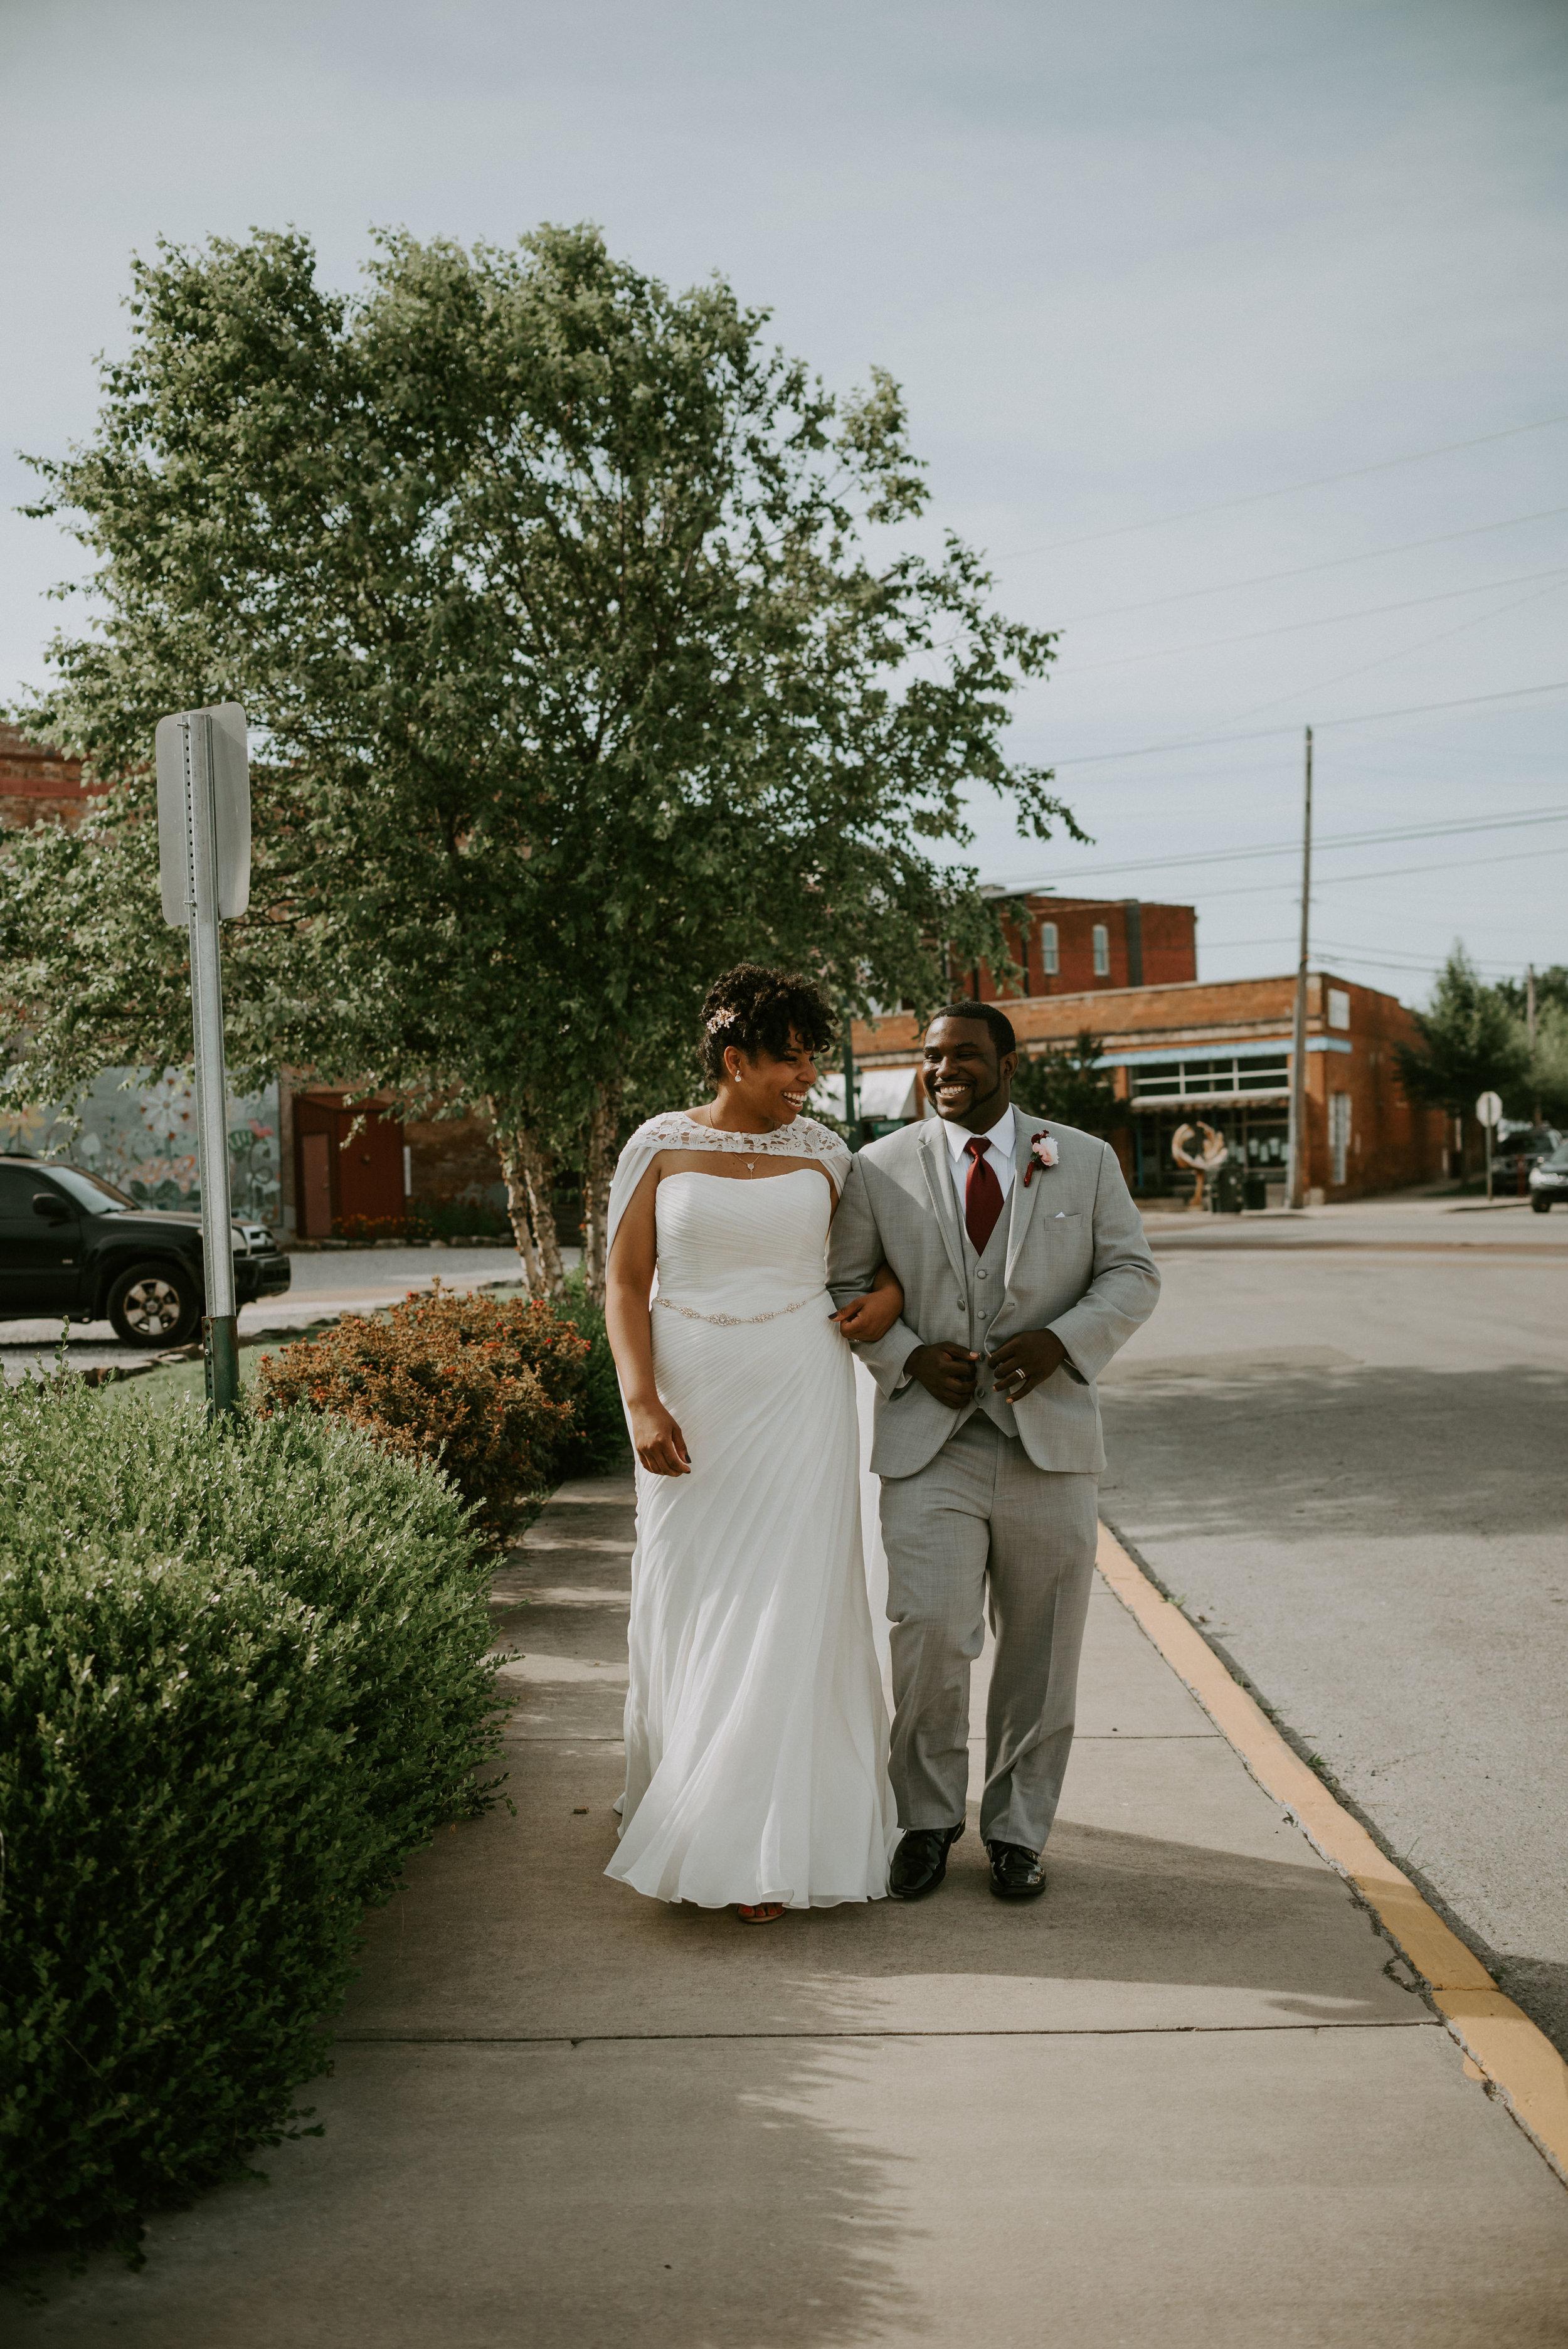 WonderlyCreative_Wedding_6.7.18_Khara&Dwayne_-762.jpg